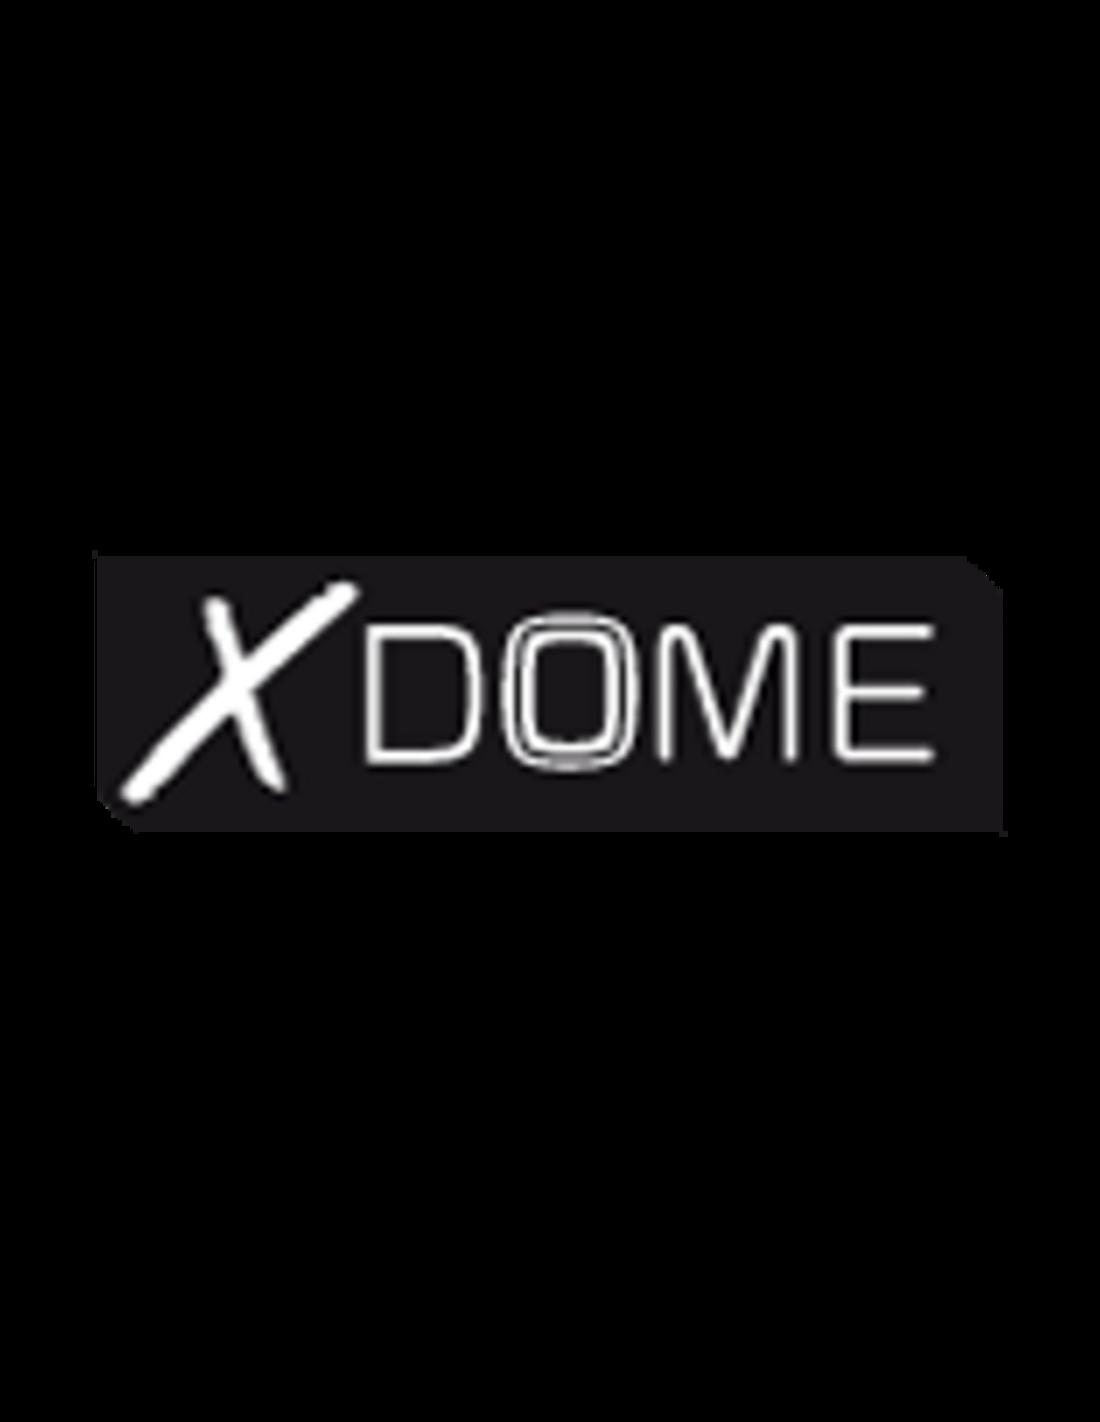 XDOME